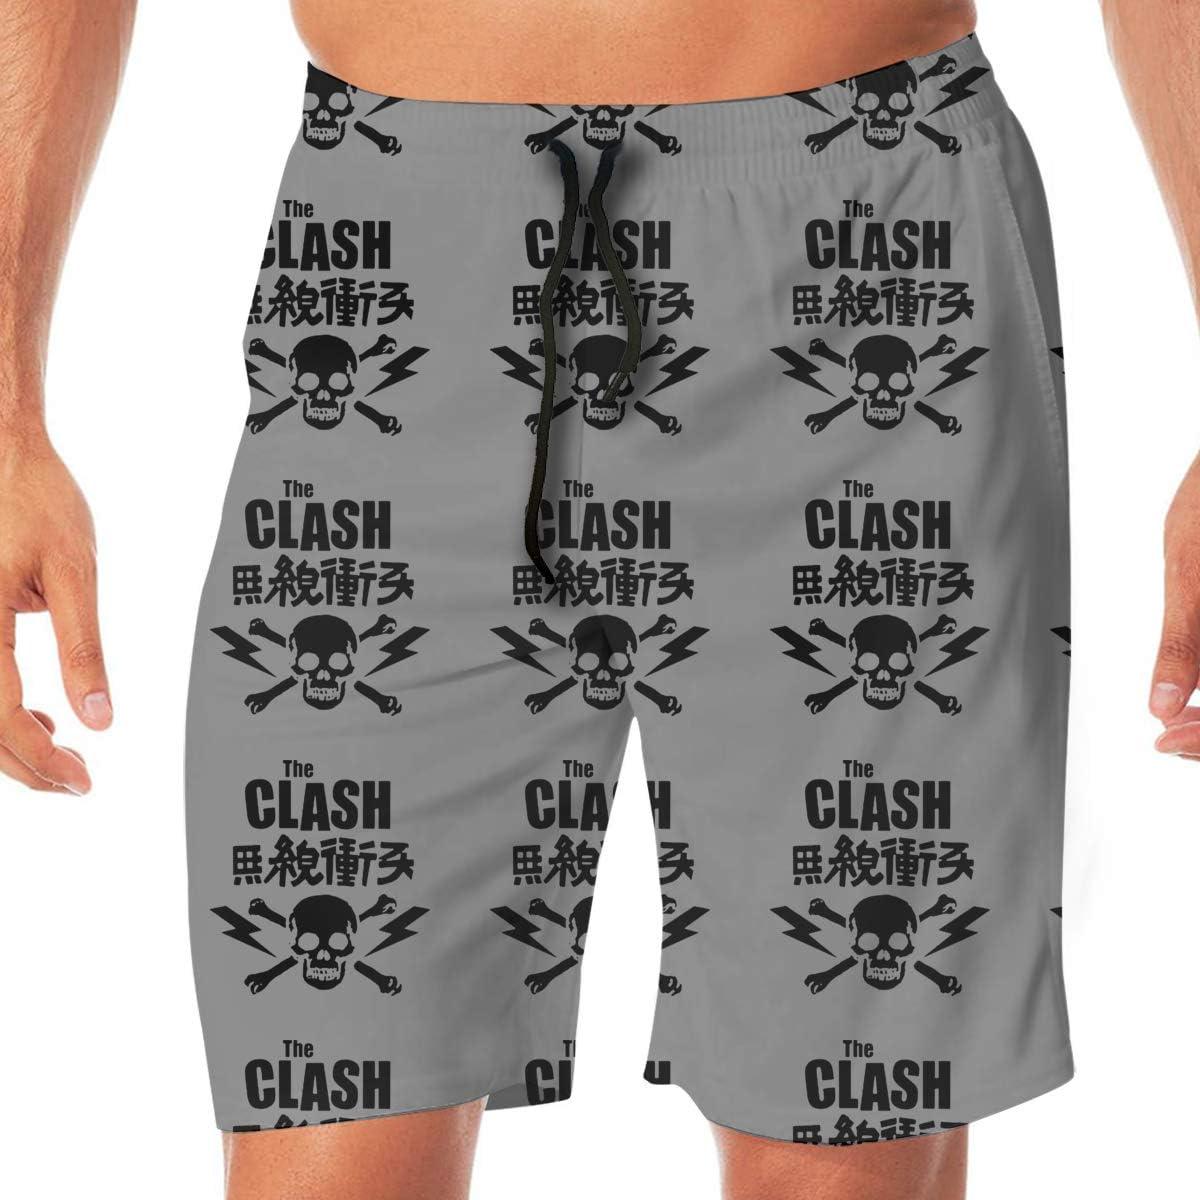 Mens Shorts Trunk Summer Pockets The Clash Swim Beach Athletic Quick Dry Beachwear Boardshort